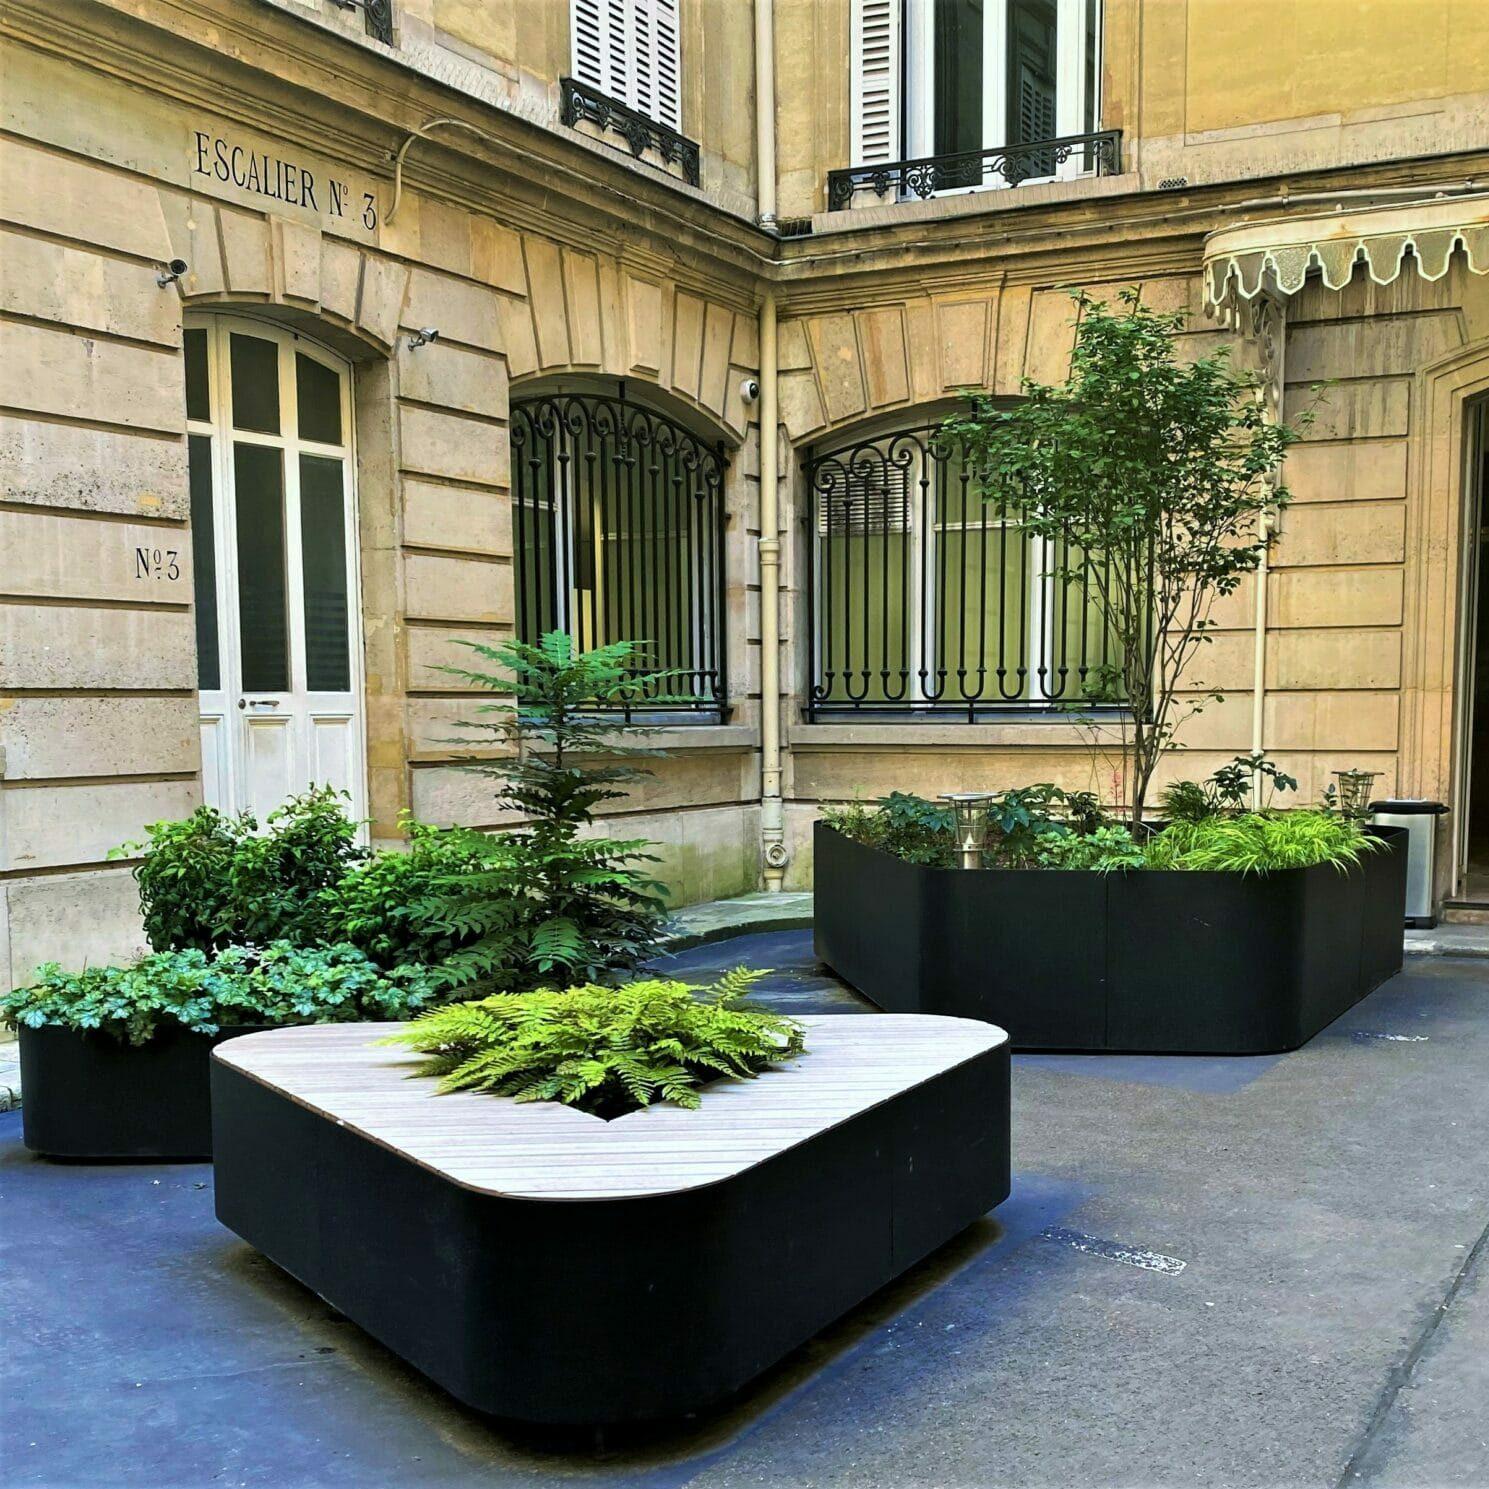 Bespoke triangular planter in painted aluminium and wood seats